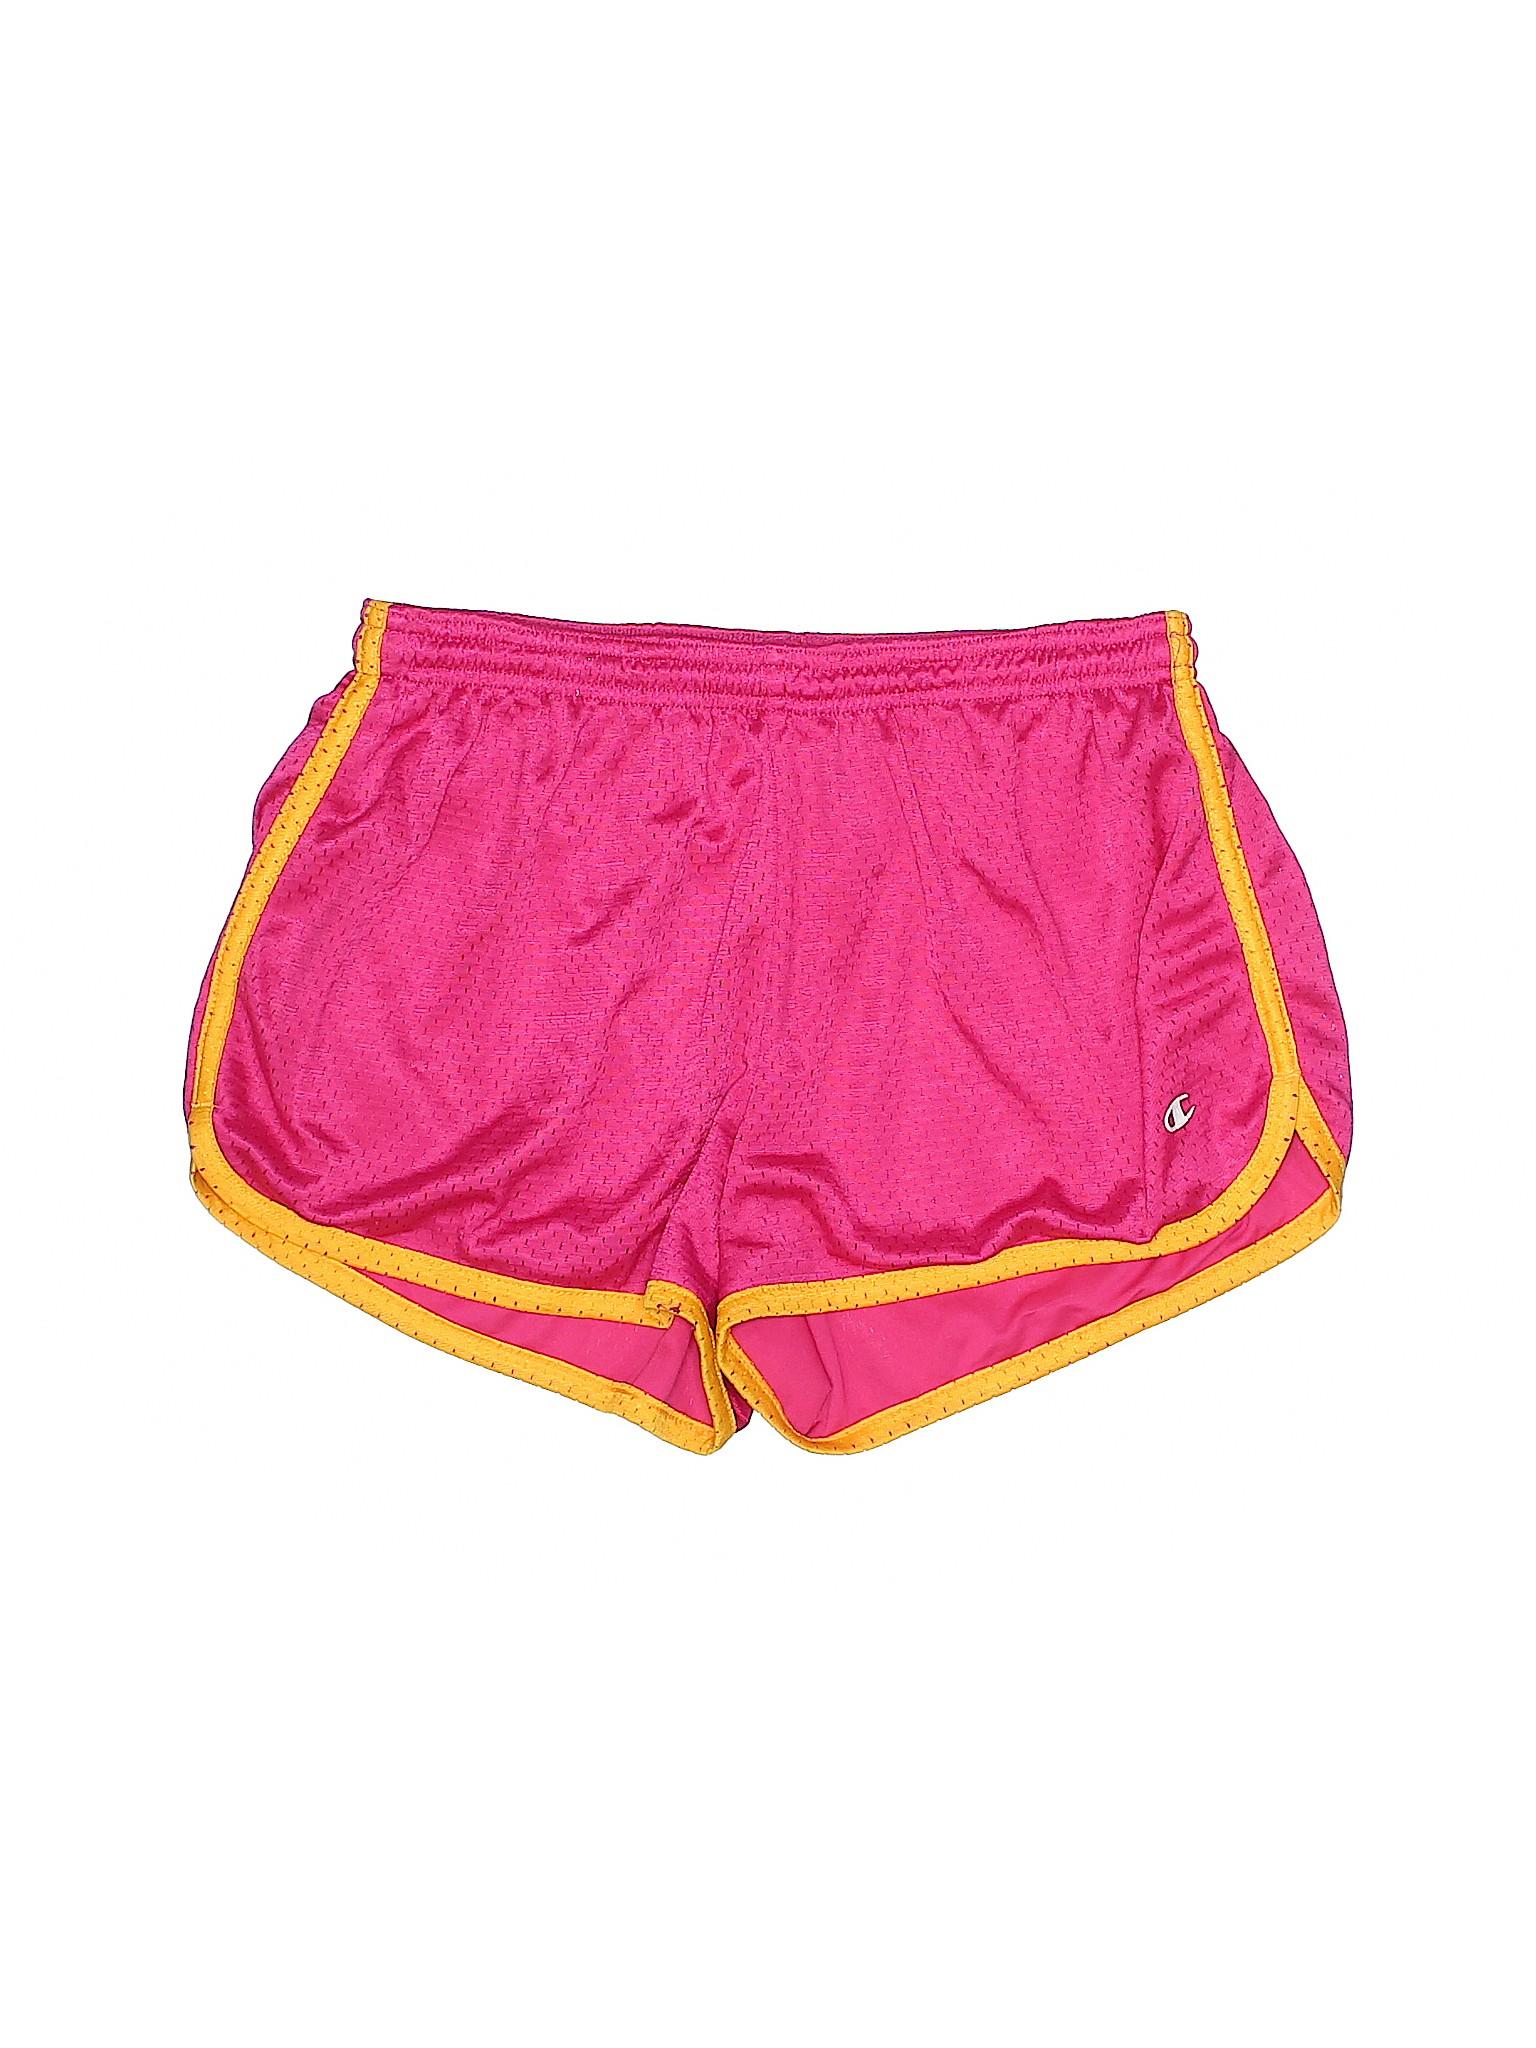 Champion Shorts Boutique Shorts Champion Boutique Boutique Champion Athletic Athletic xHw8qI